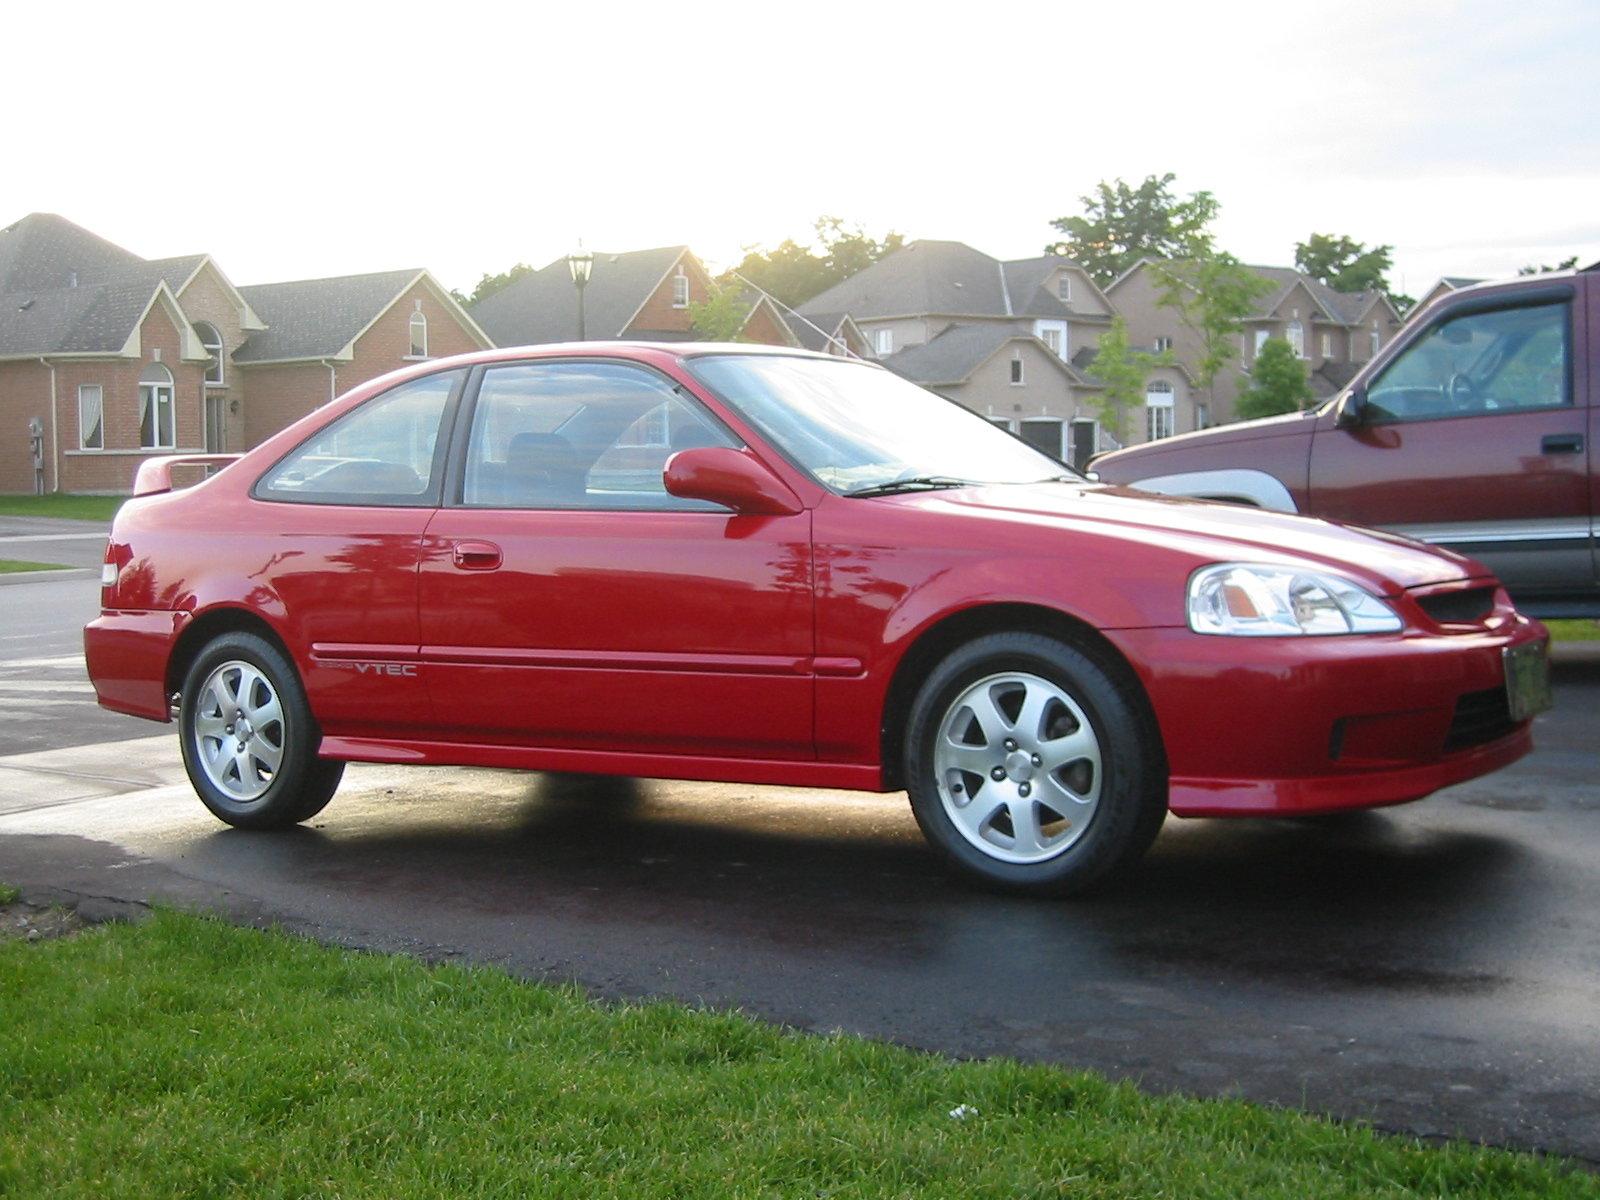 for sale 2000 civic sir coupe   s2ki honda s2000 forums